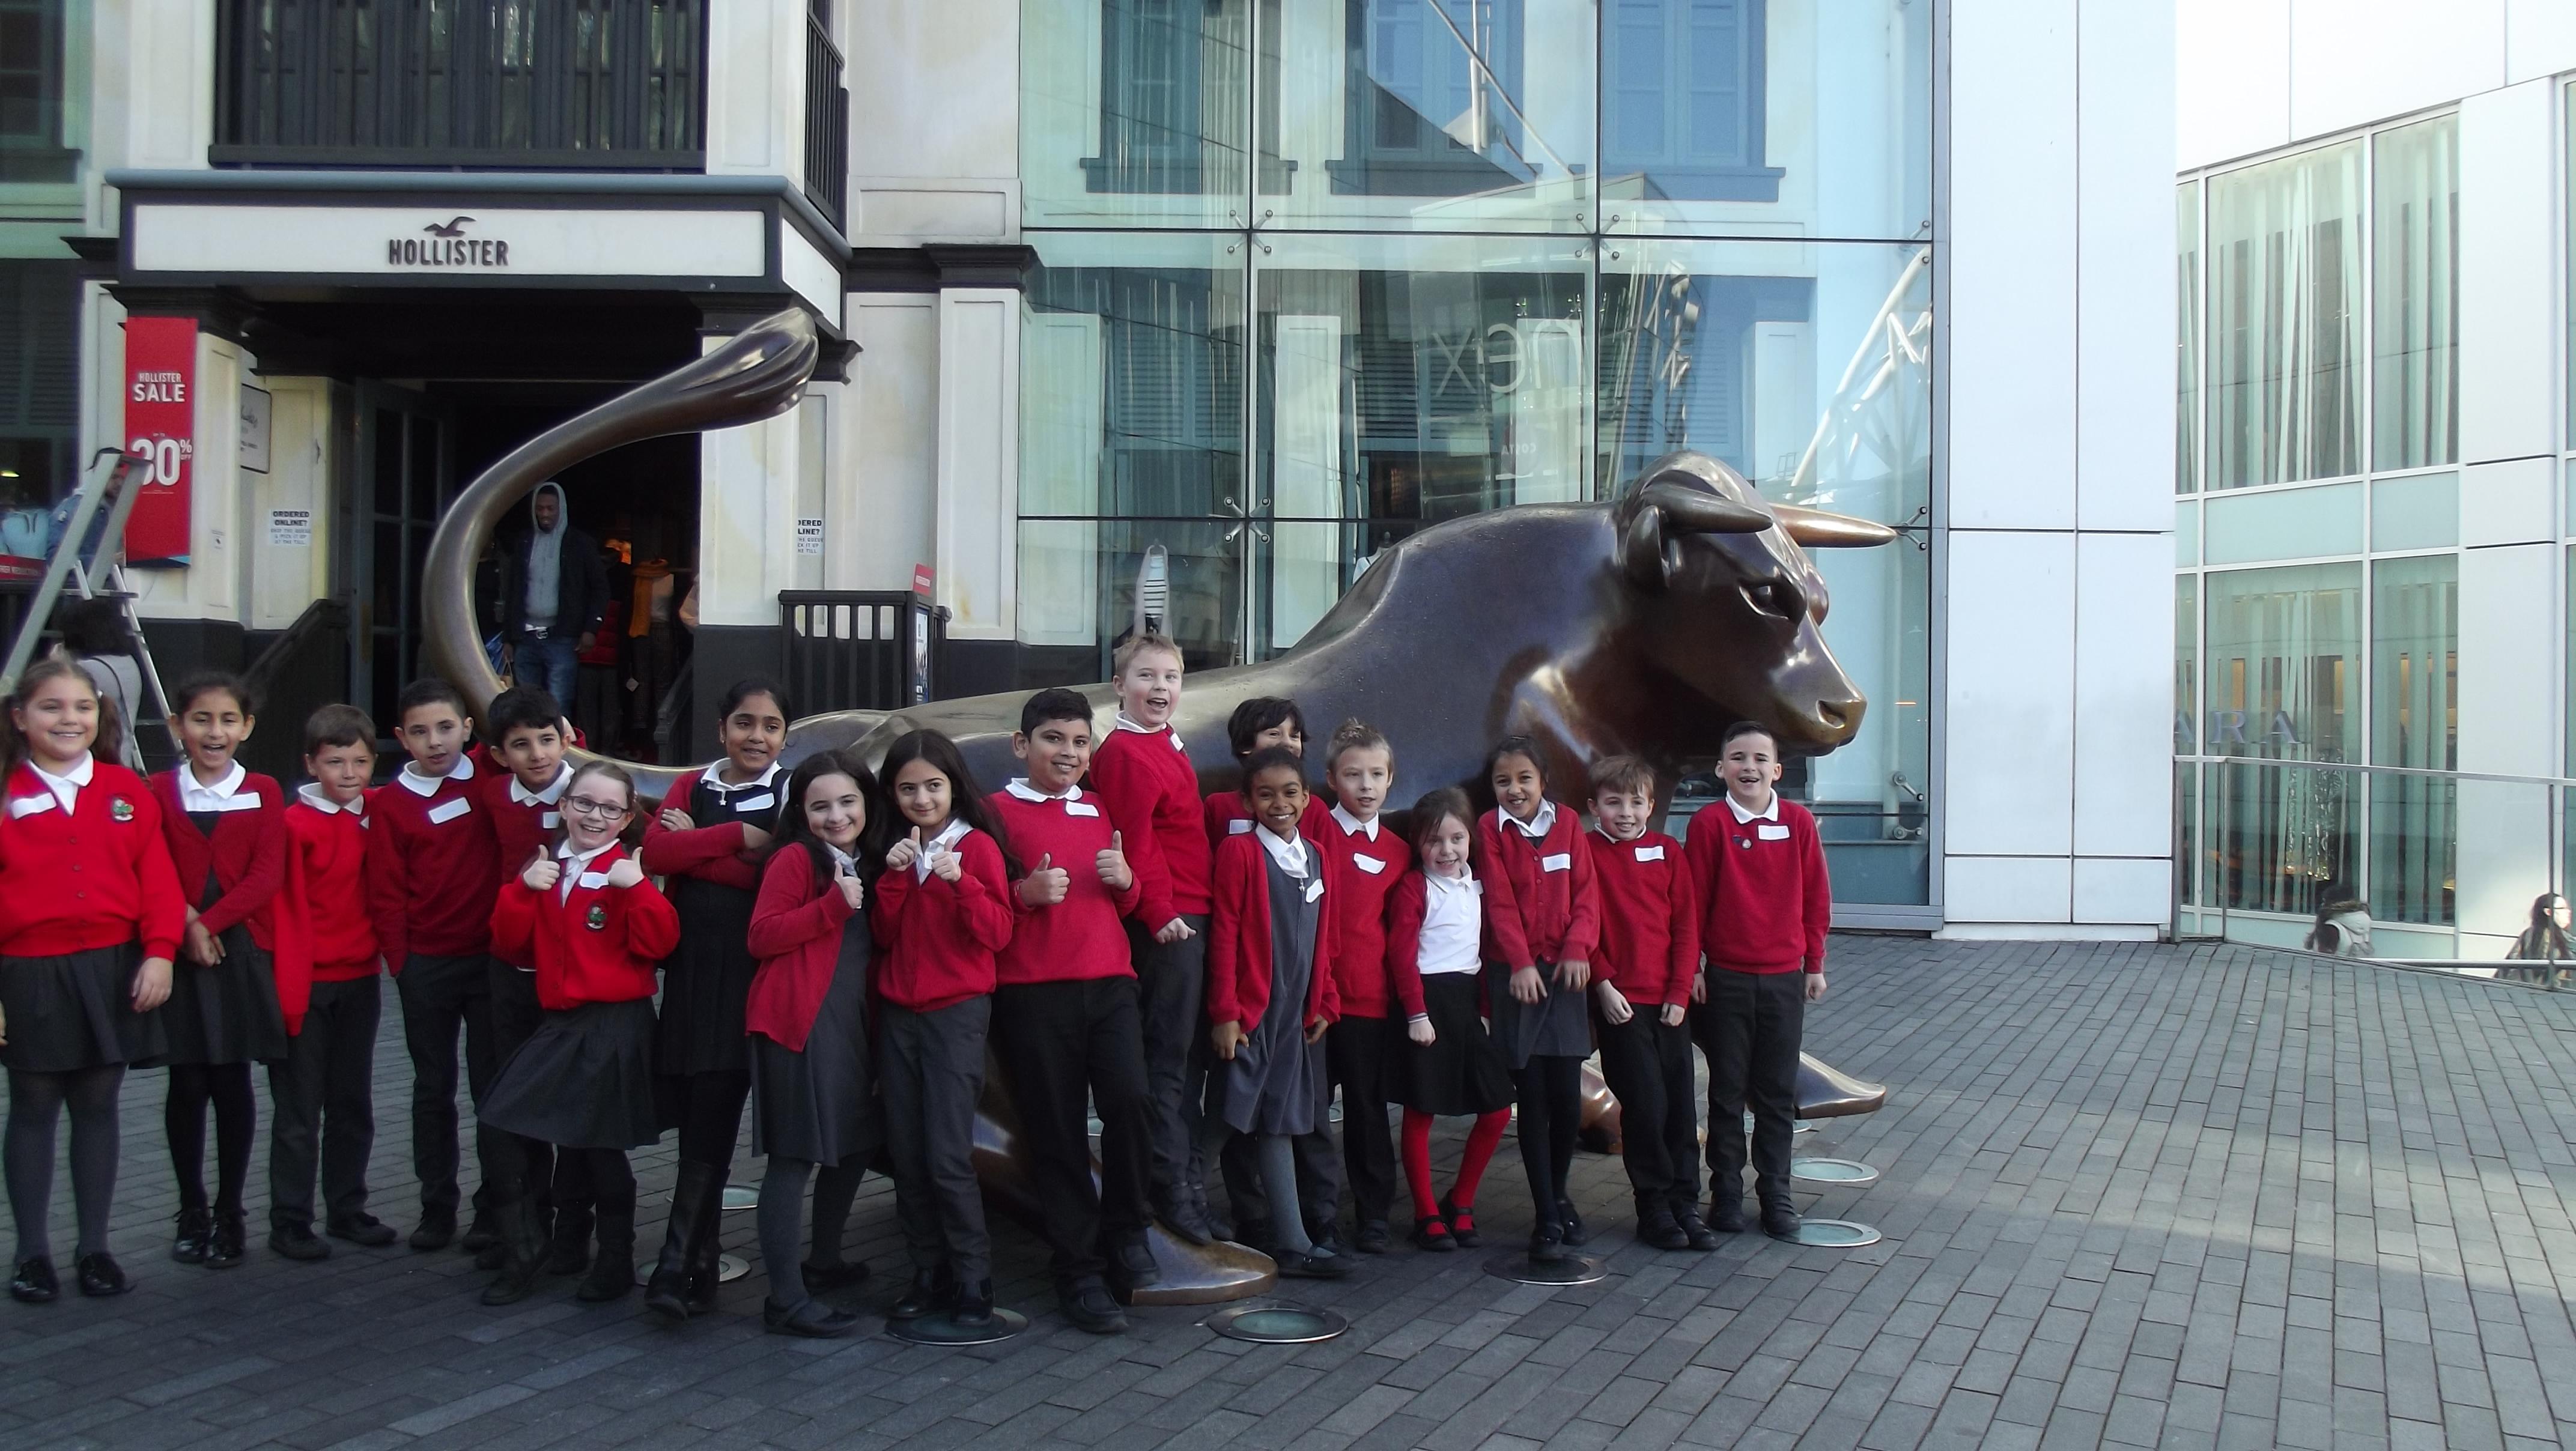 Bullring school tour